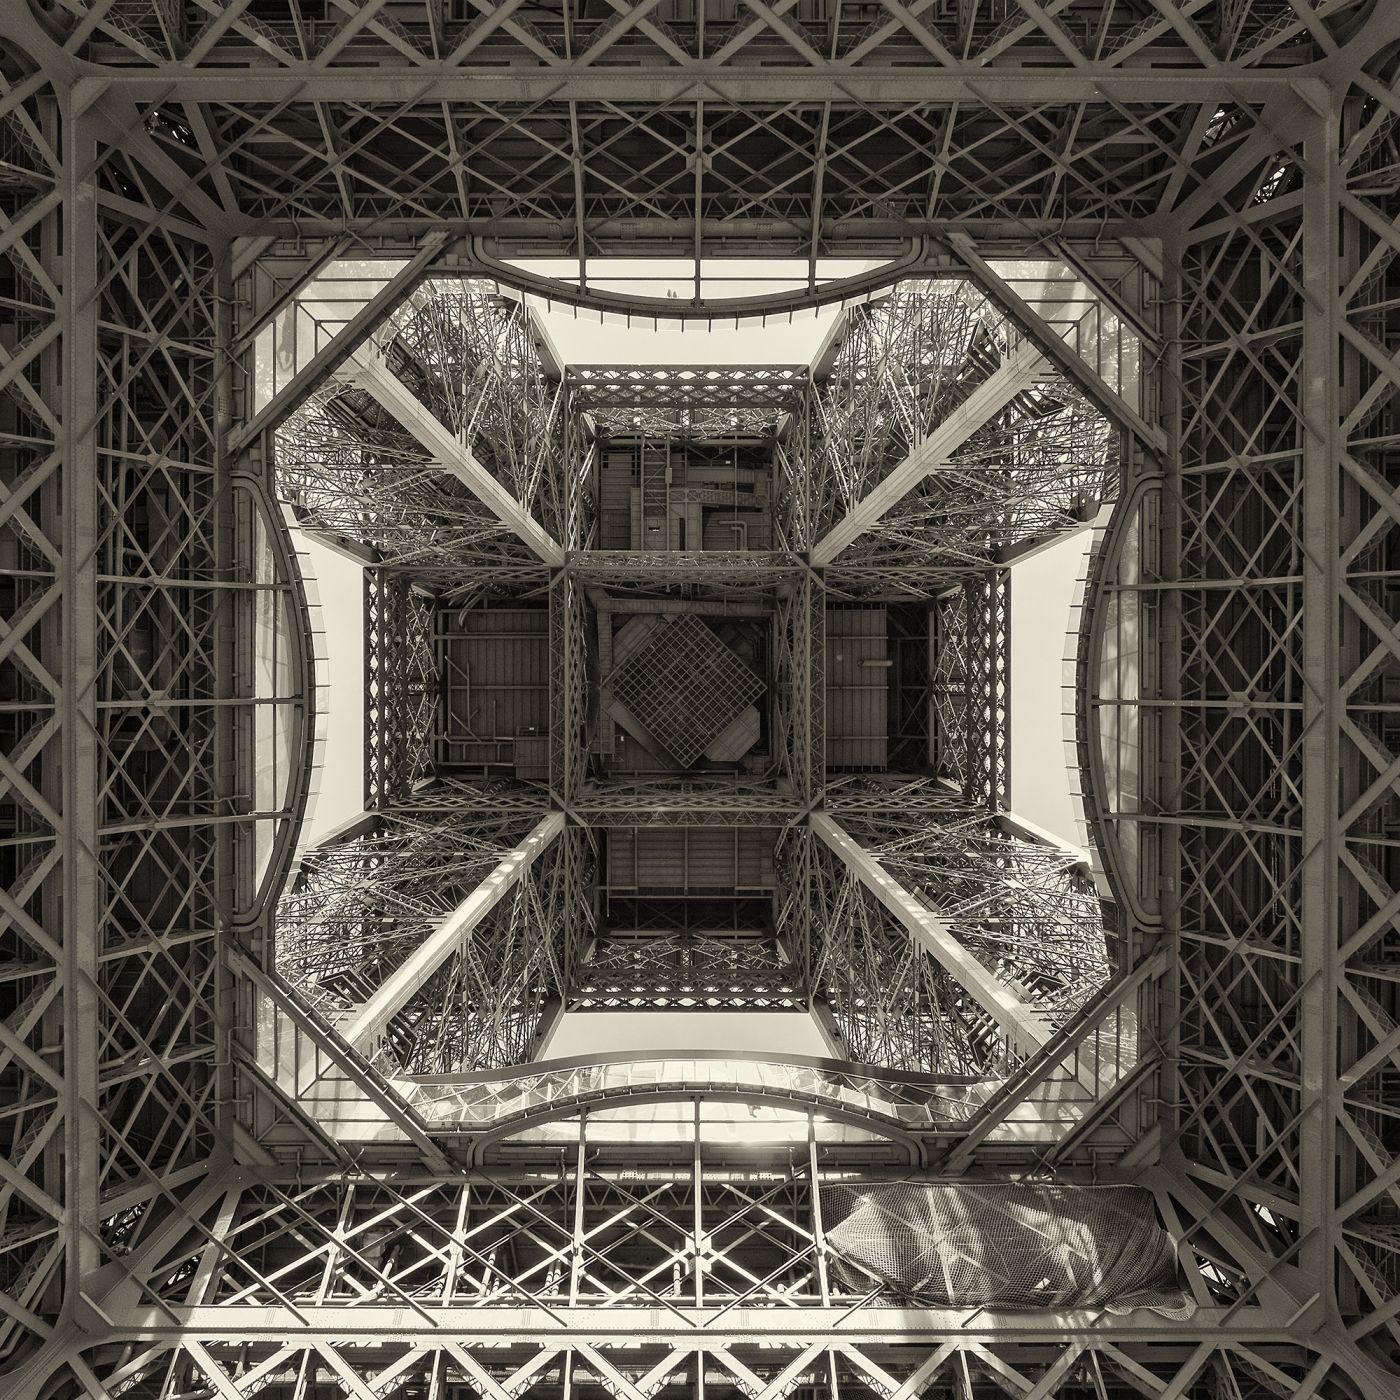 Tour Eiffel from below, France